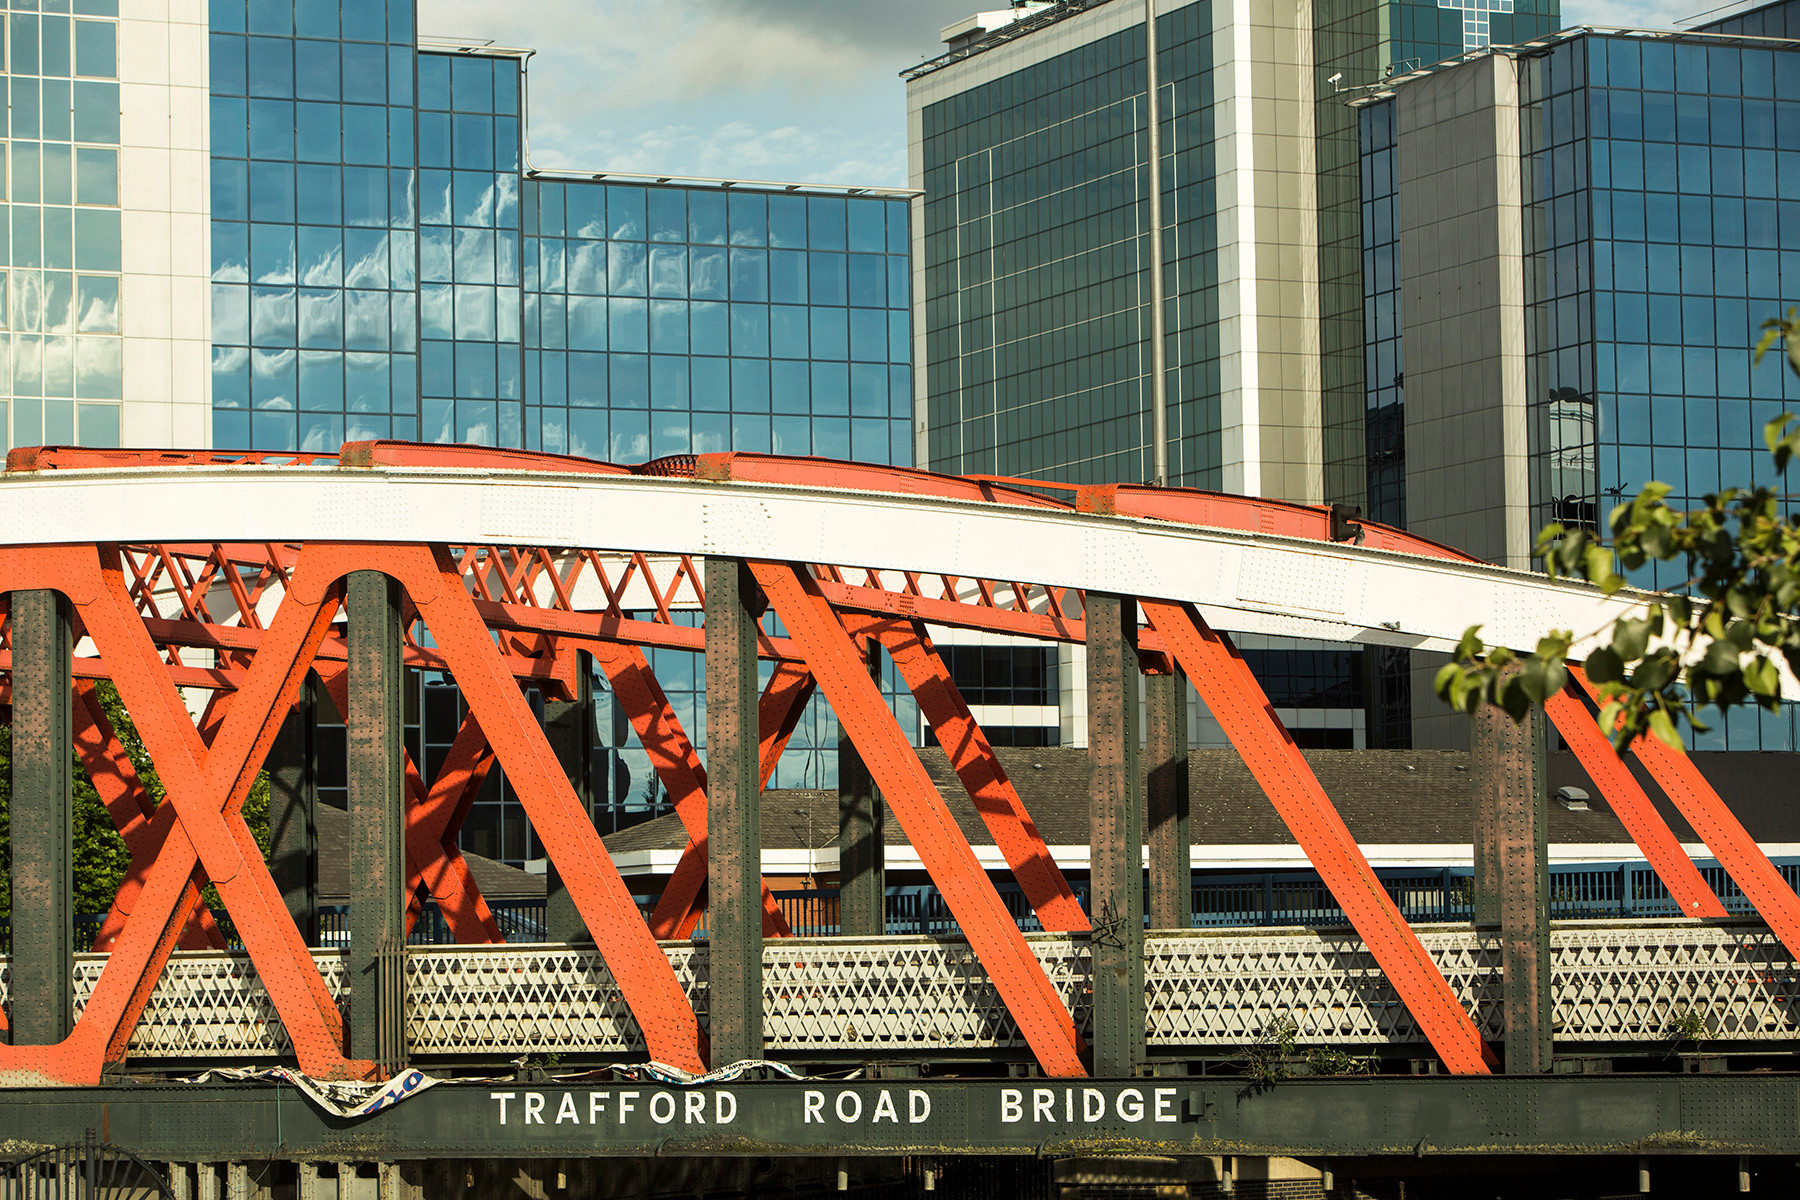 Manchester, Trafford Road Bridge